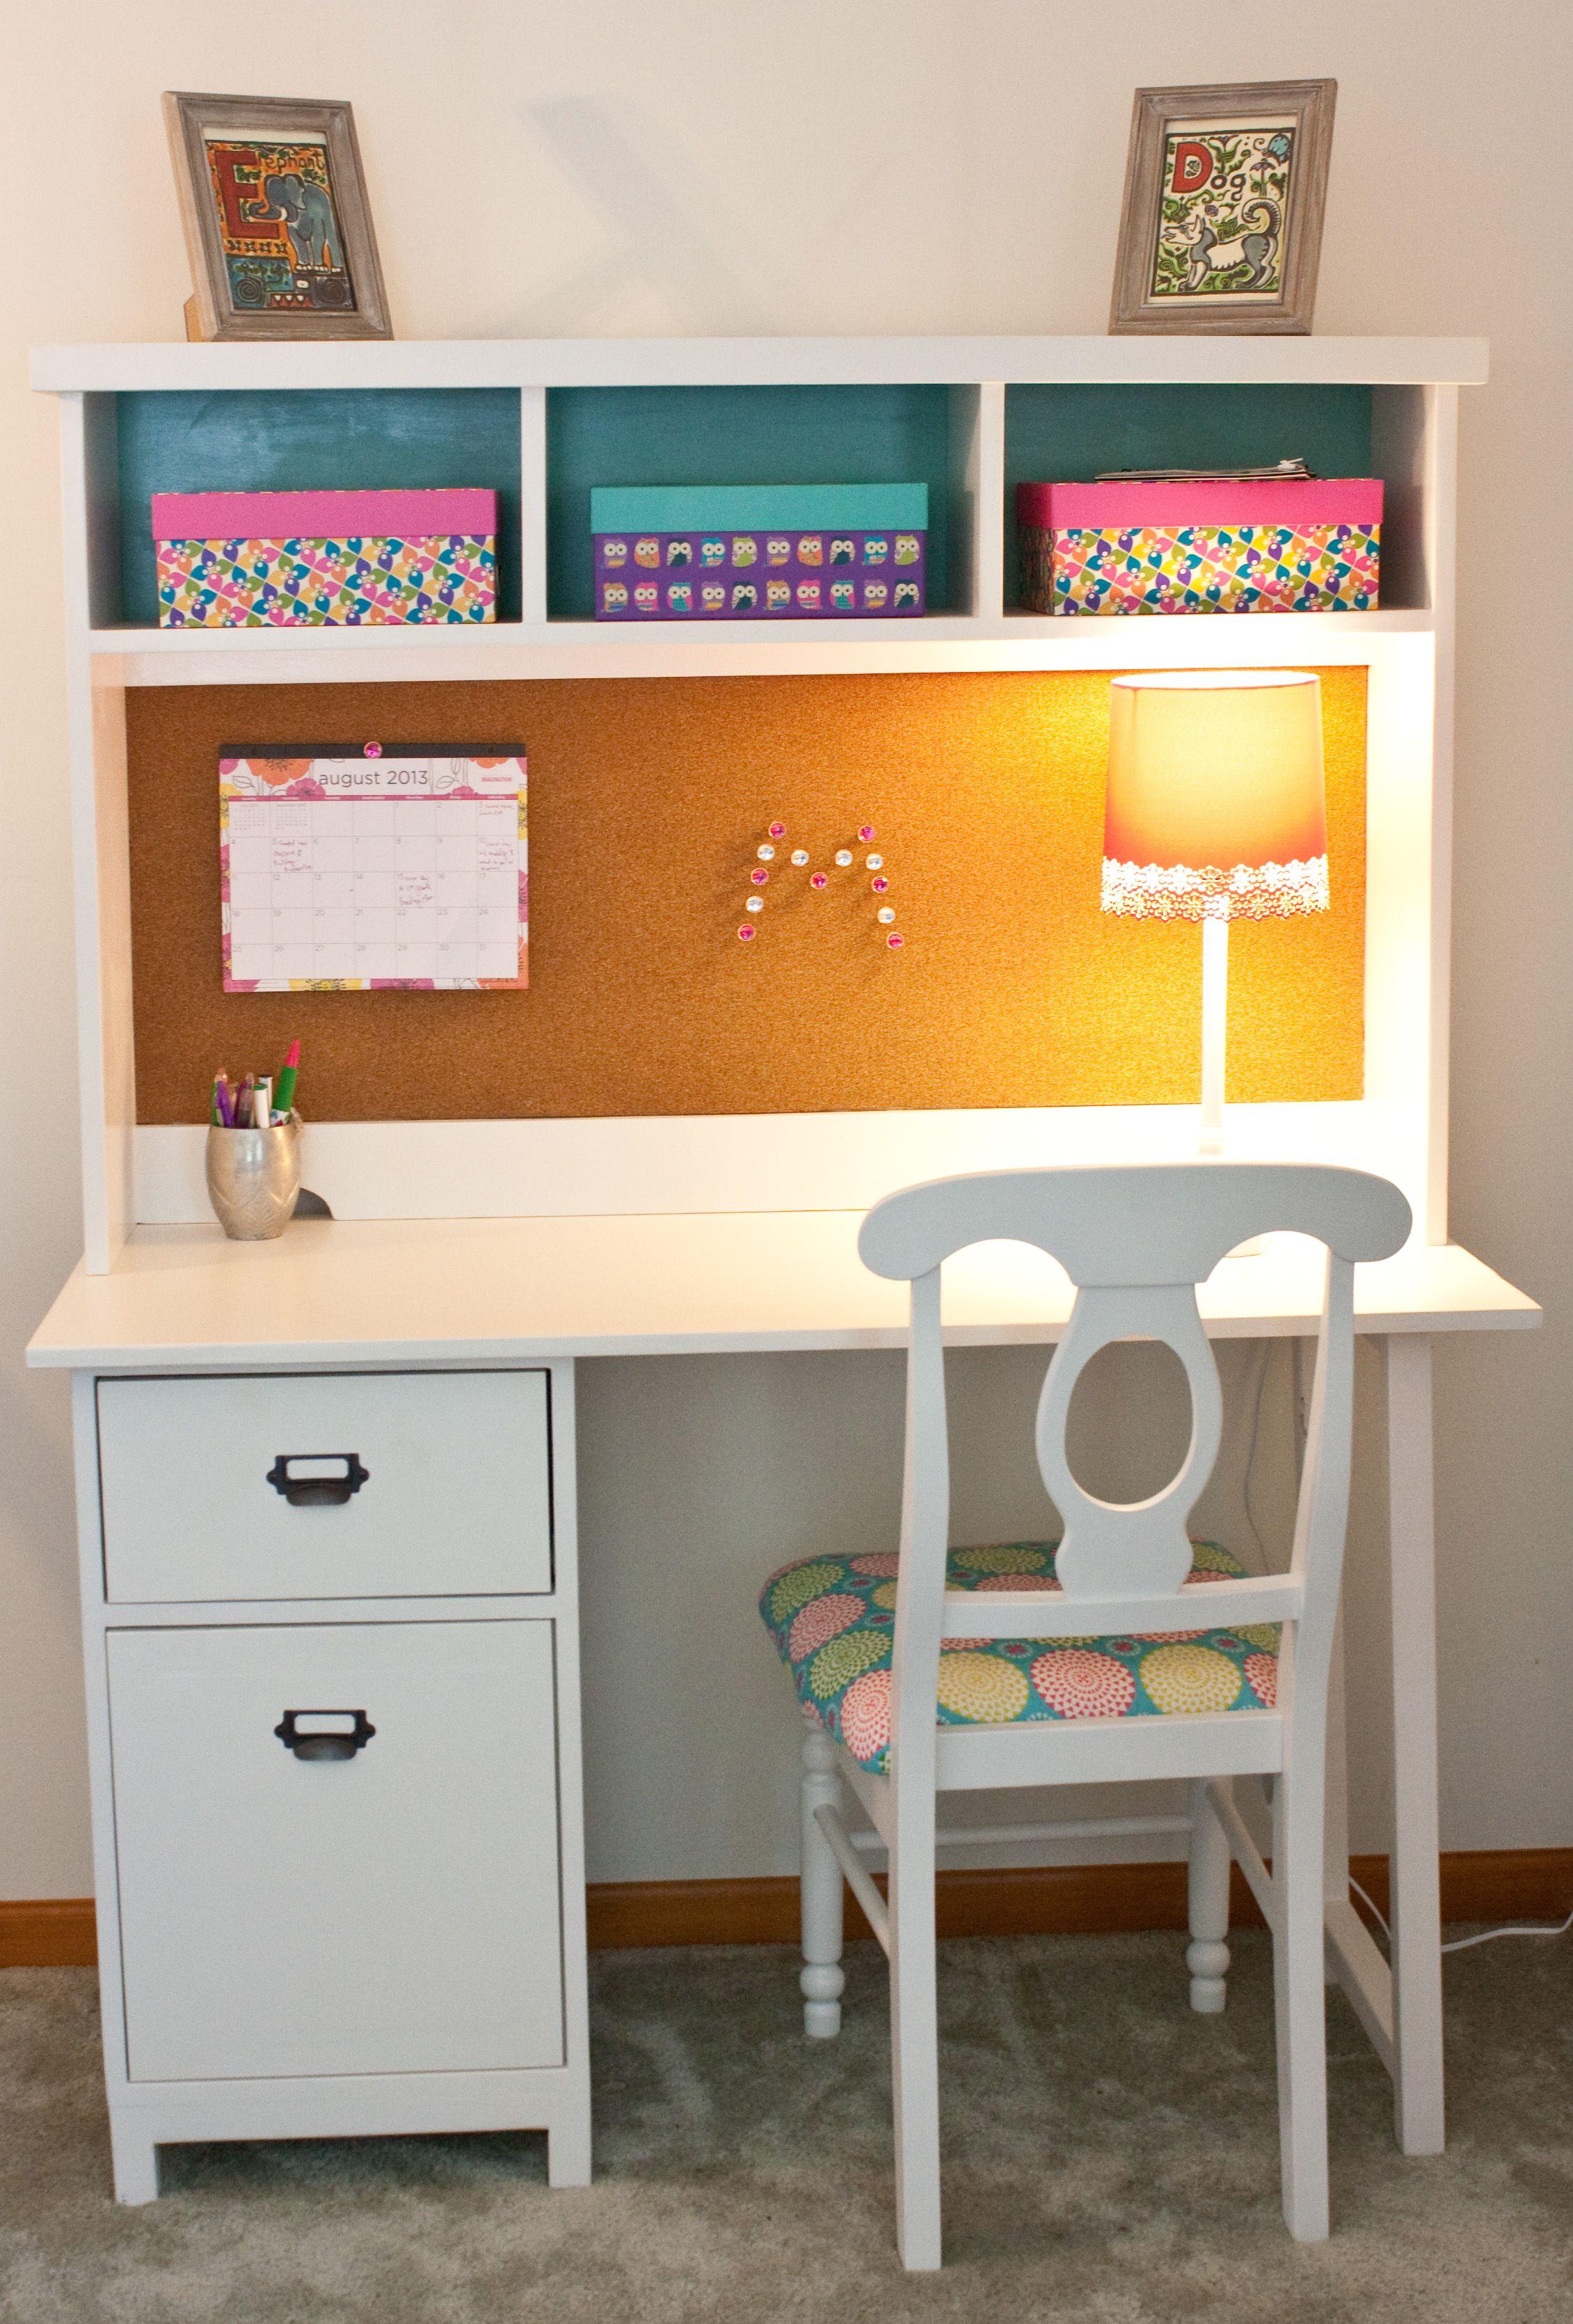 School Desk--1 for each child, please.